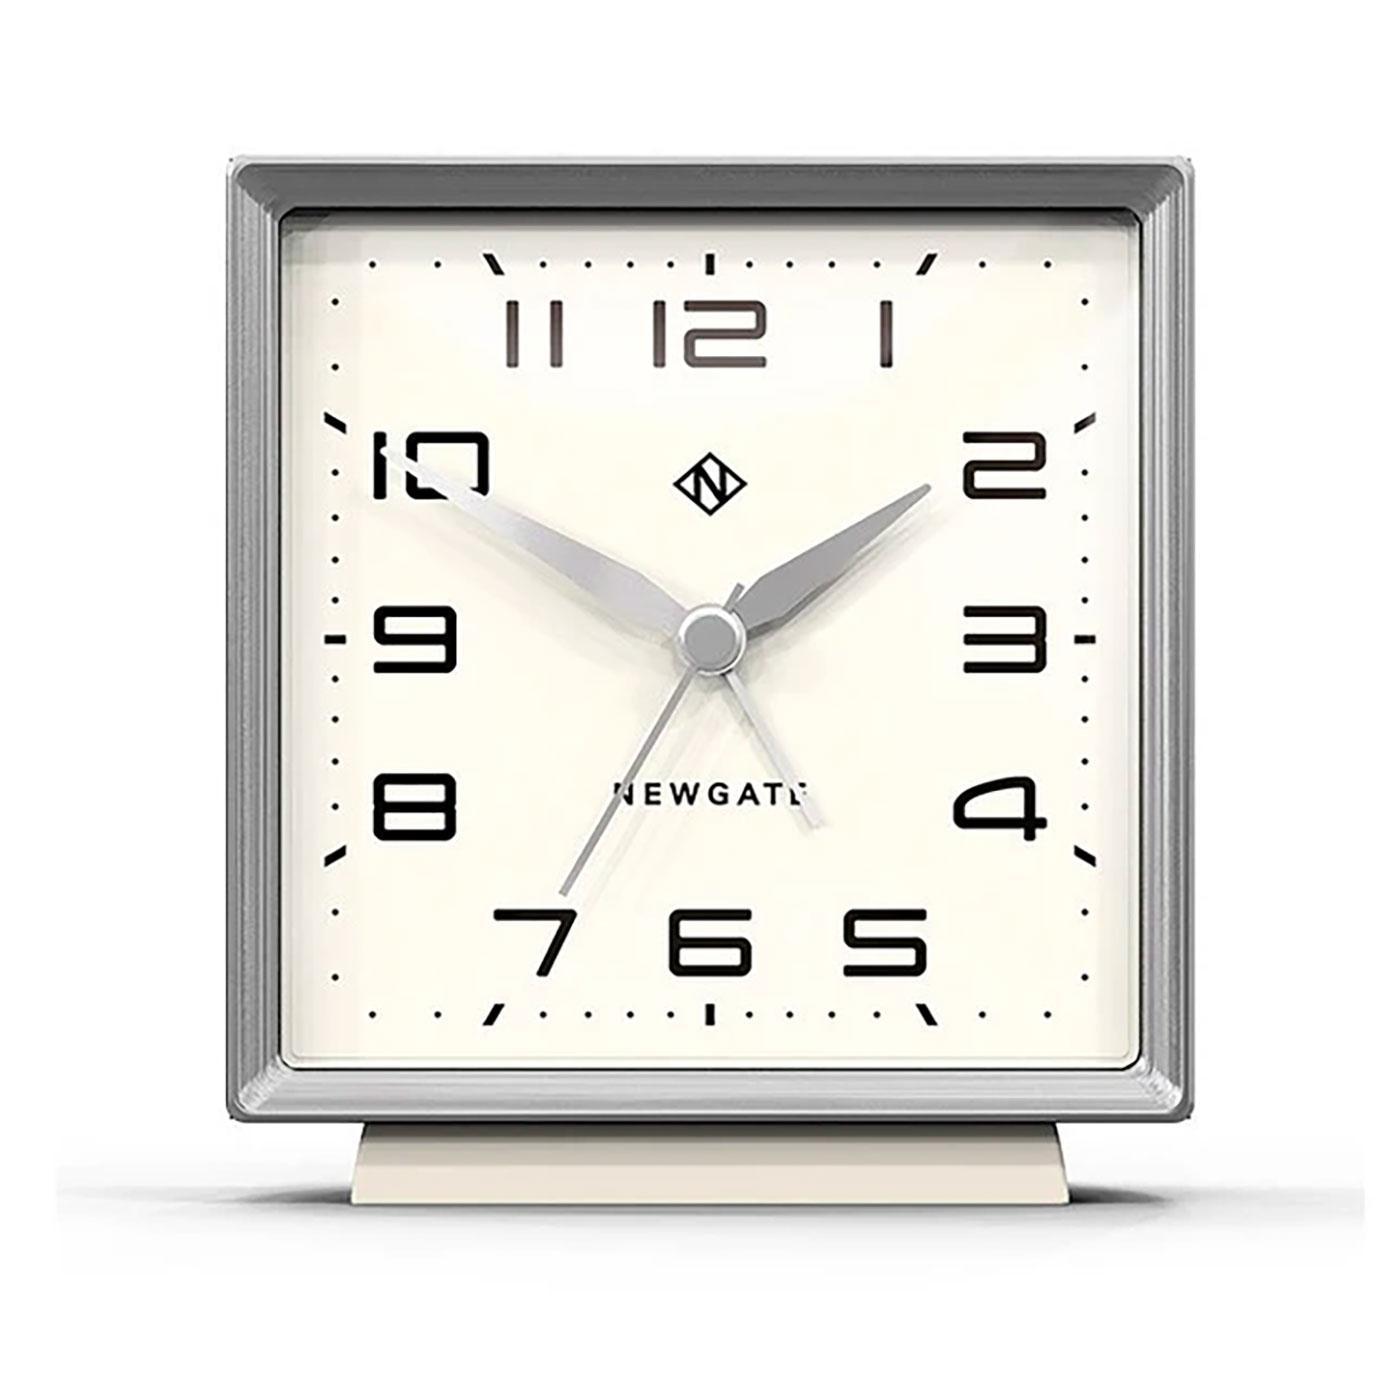 Skyscraper NEWGATE CLOCKS Retro Alarm Clock LG